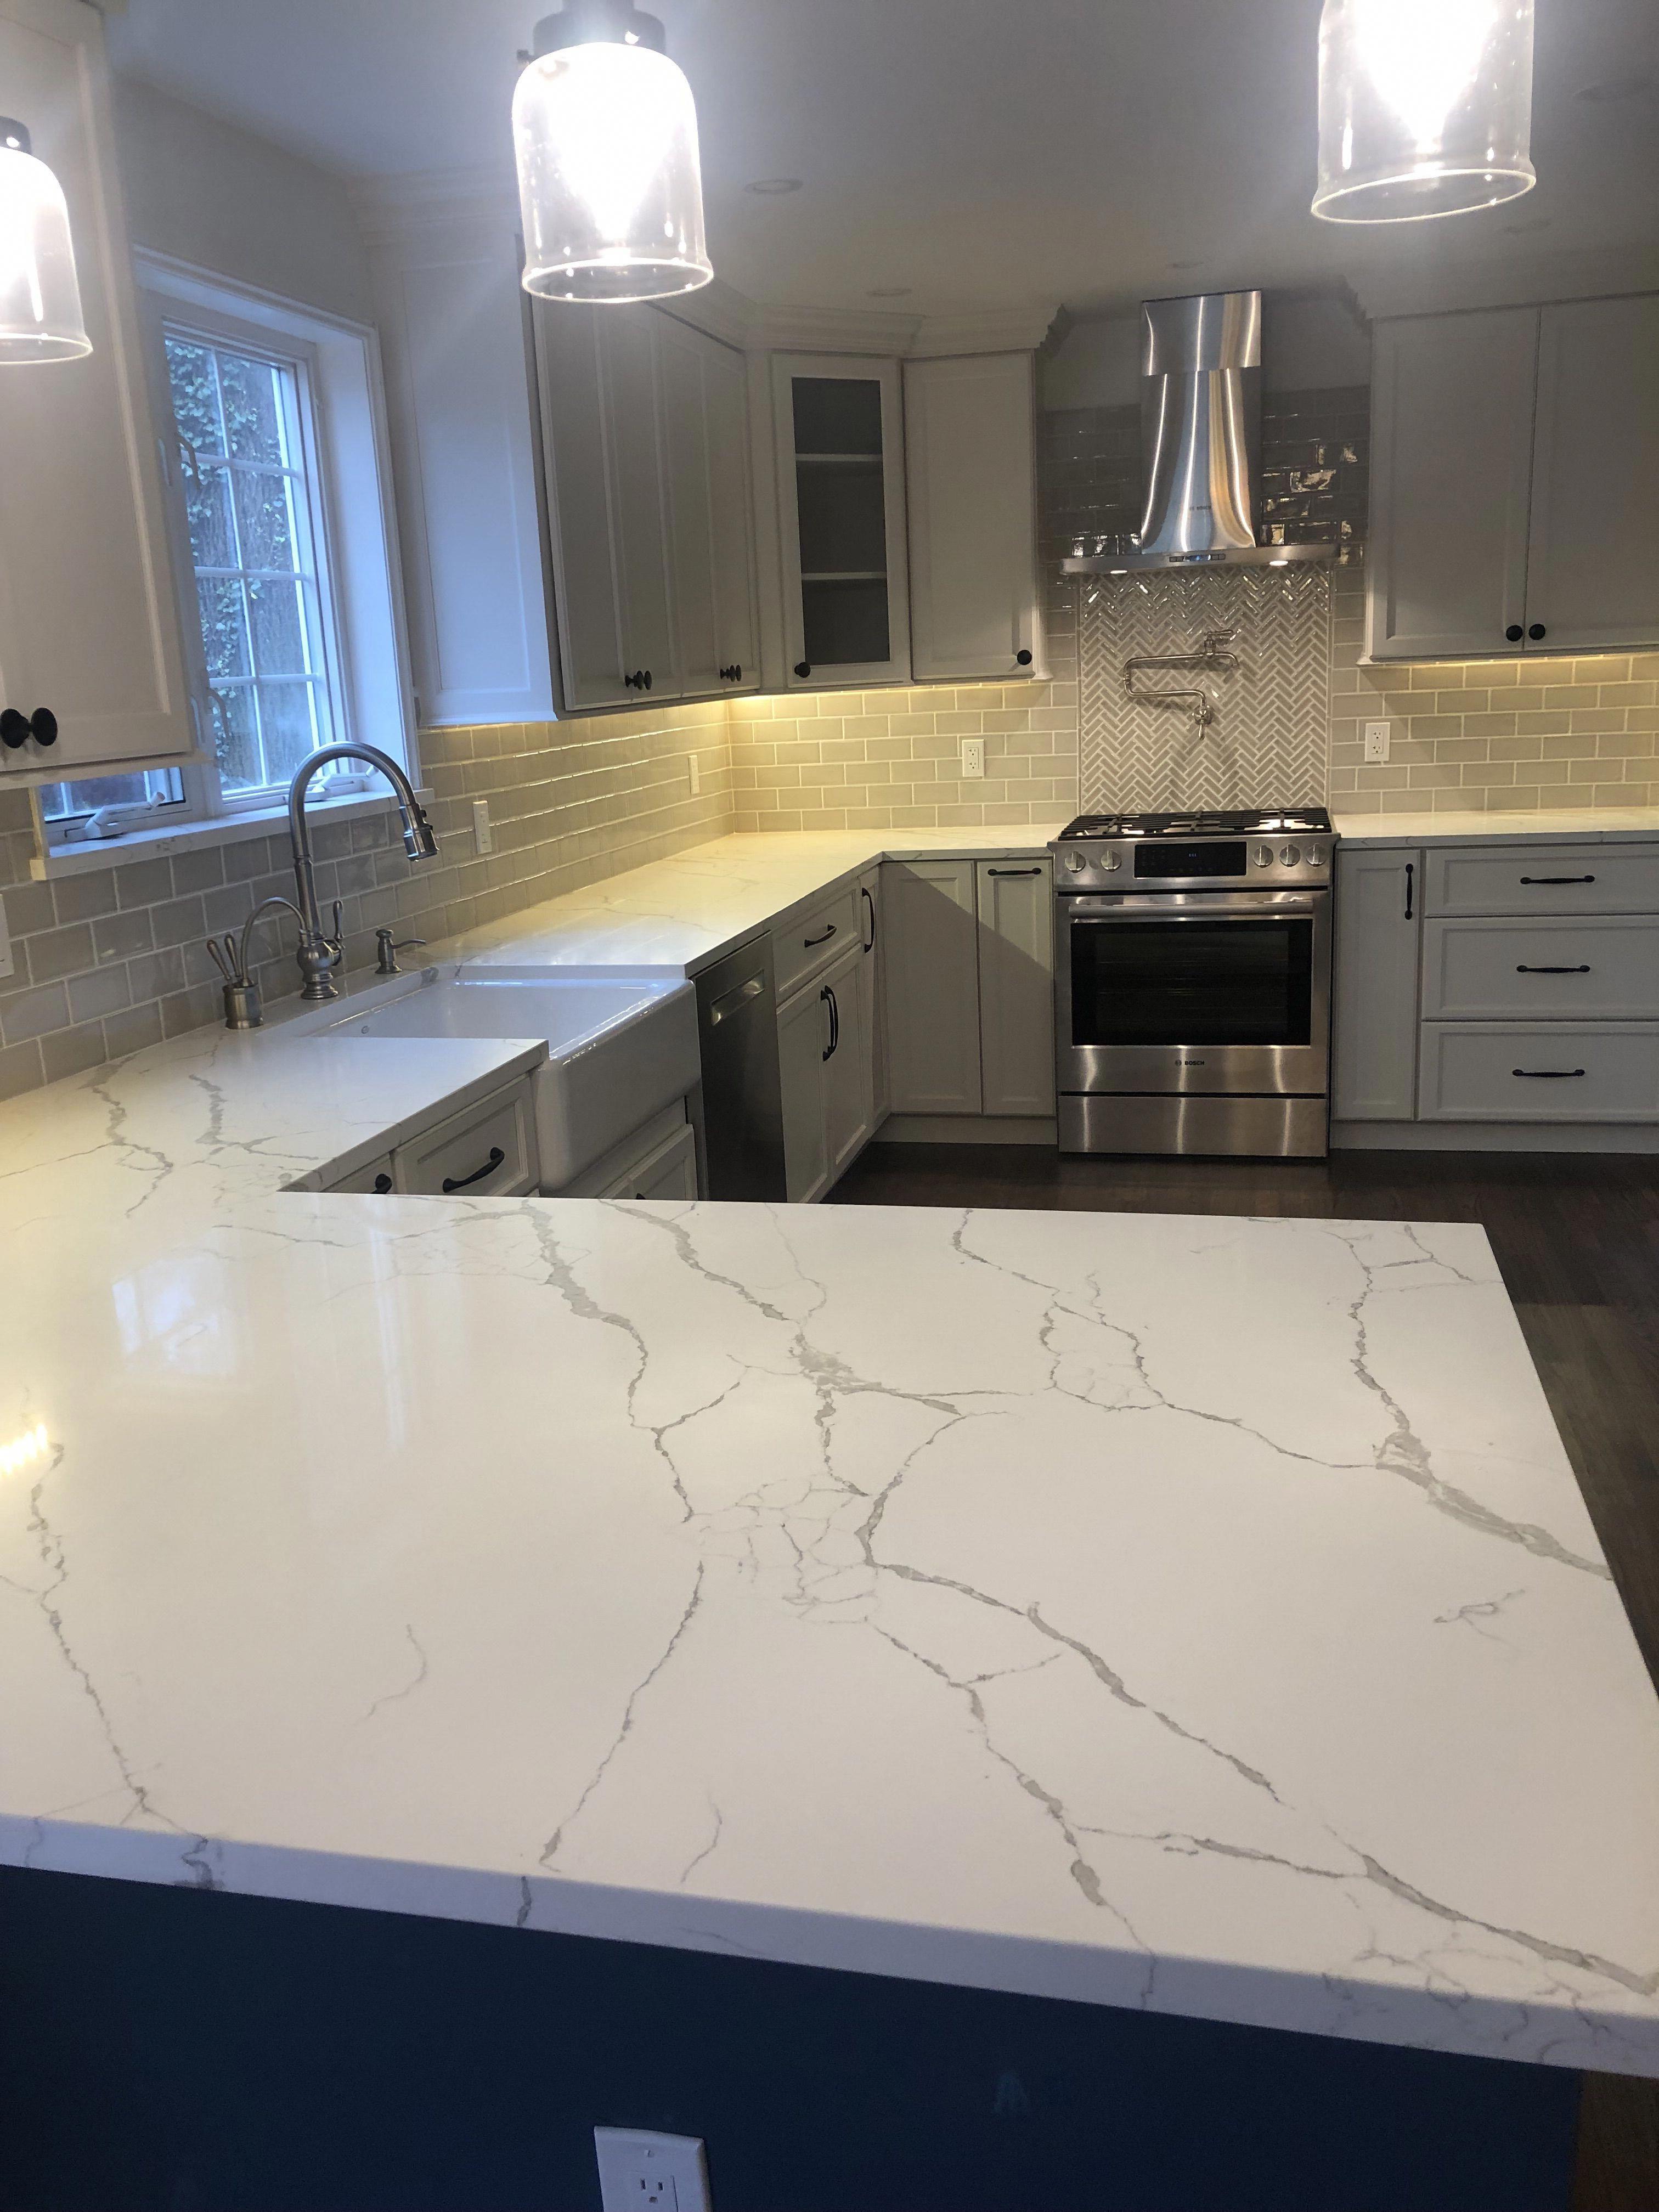 Pin By Shawna Smith Lorch On Home Decor In 2020 Quartz Kitchen Countertops Kitchen Inspiration Design Grey Kitchen Designs